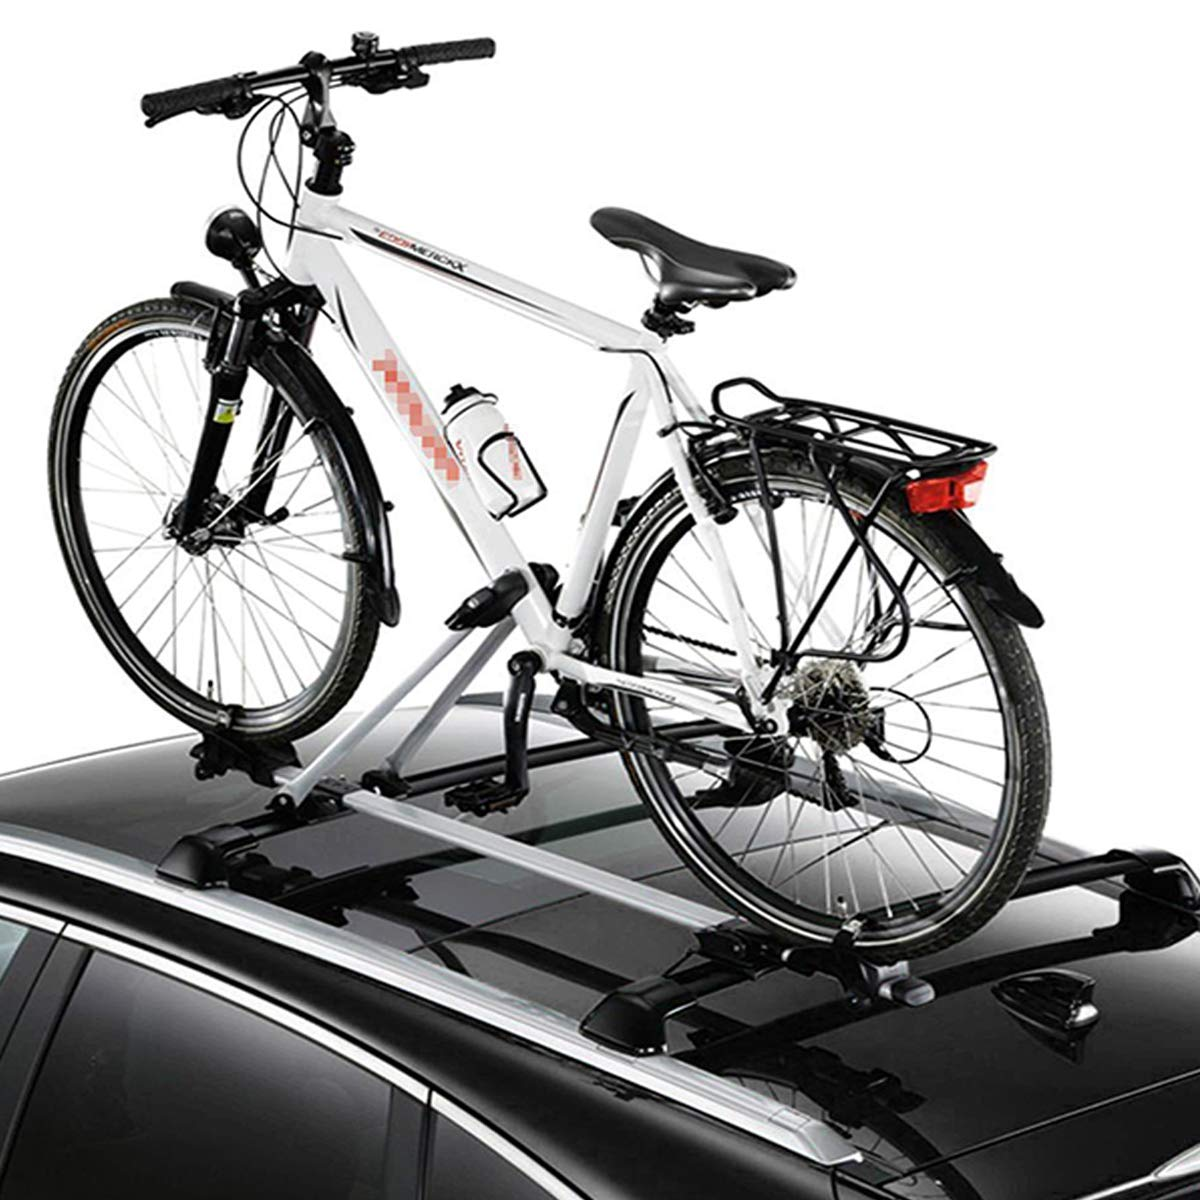 WOLTU 2 x Bike Carrier Car Roof Rack Bike Holder Made of Aluminum and Steel FZ1120-2